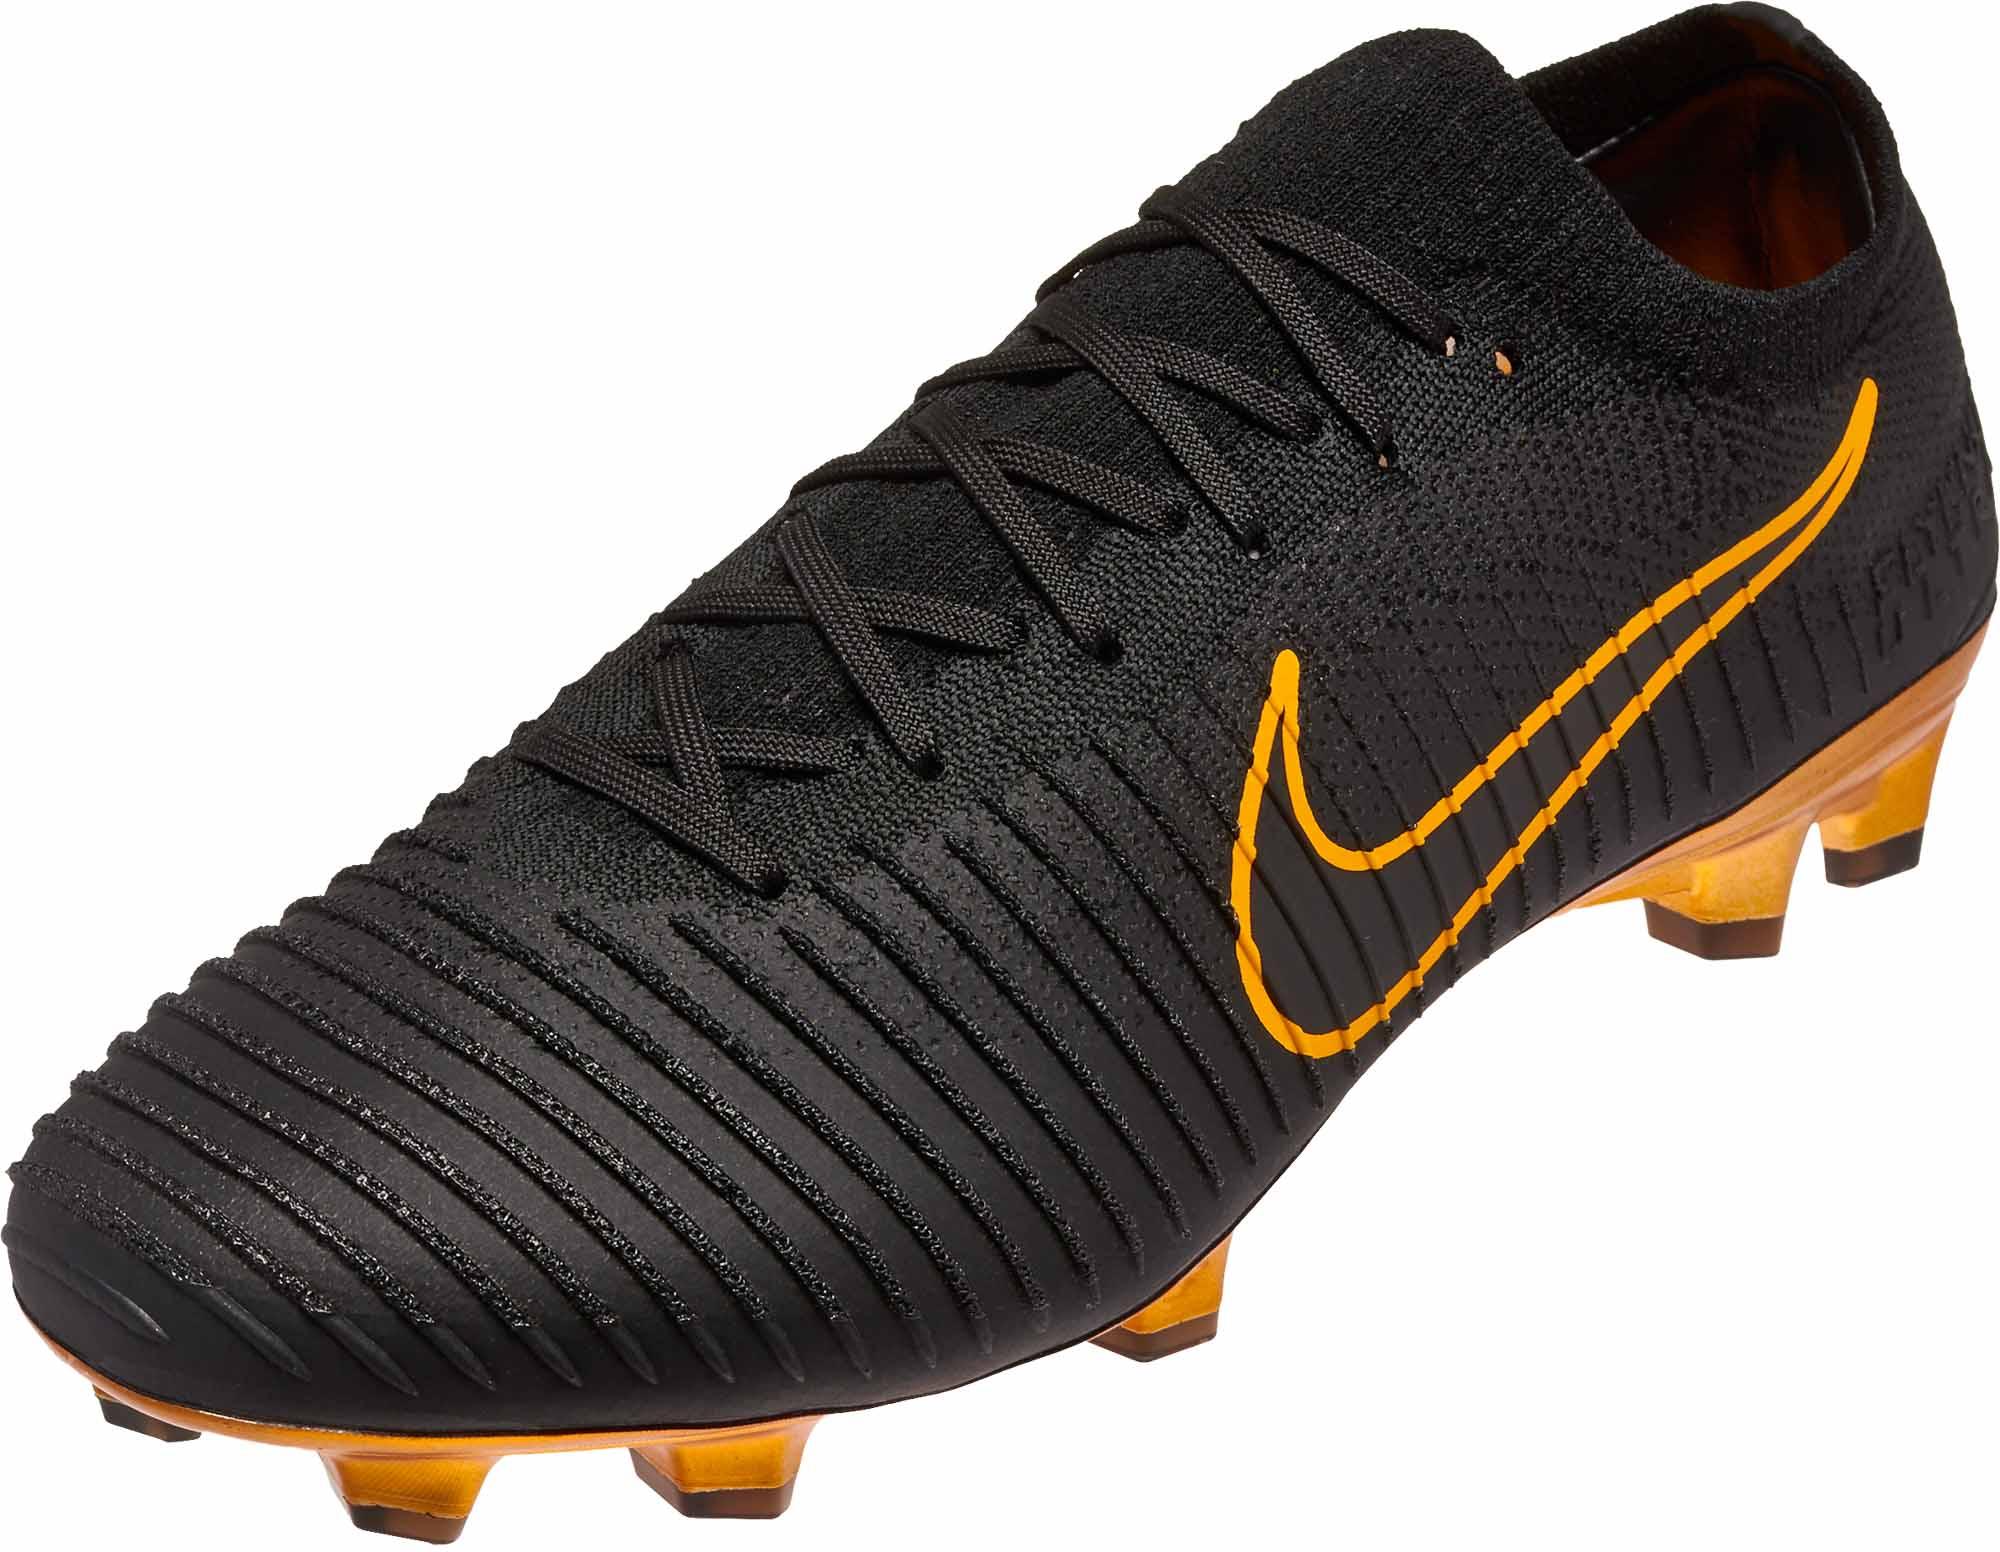 e16ba1c00928 Nike Flyknit Ultra FG - Black Nike Soccer Cleats